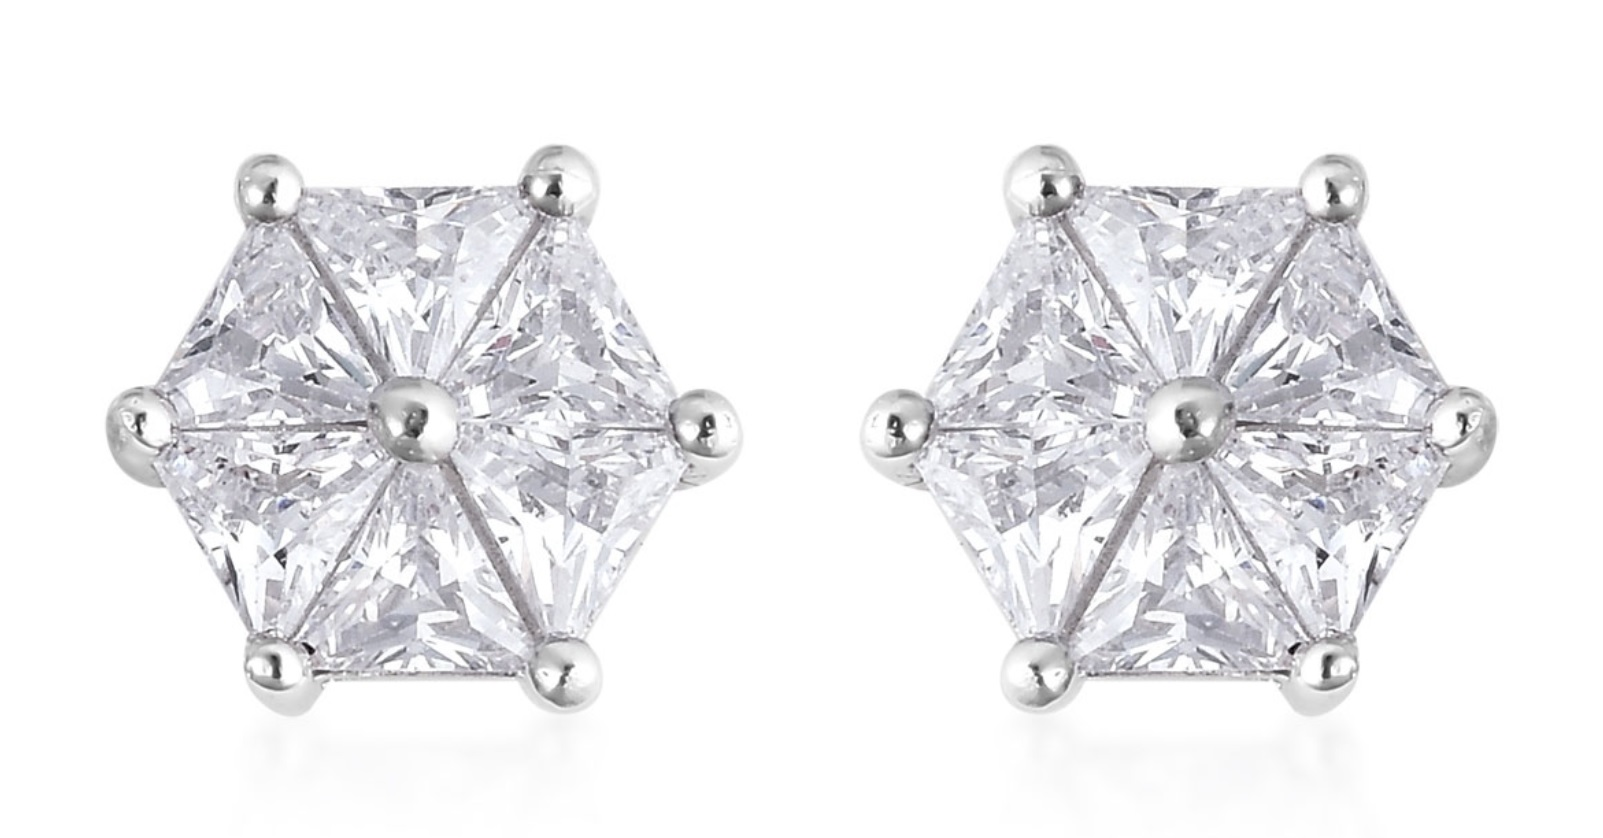 RHINESTONE SMALL John Bead 55 cm WHITE//CLOSE END High Quality Rhinestone Crystal Gems Zipper